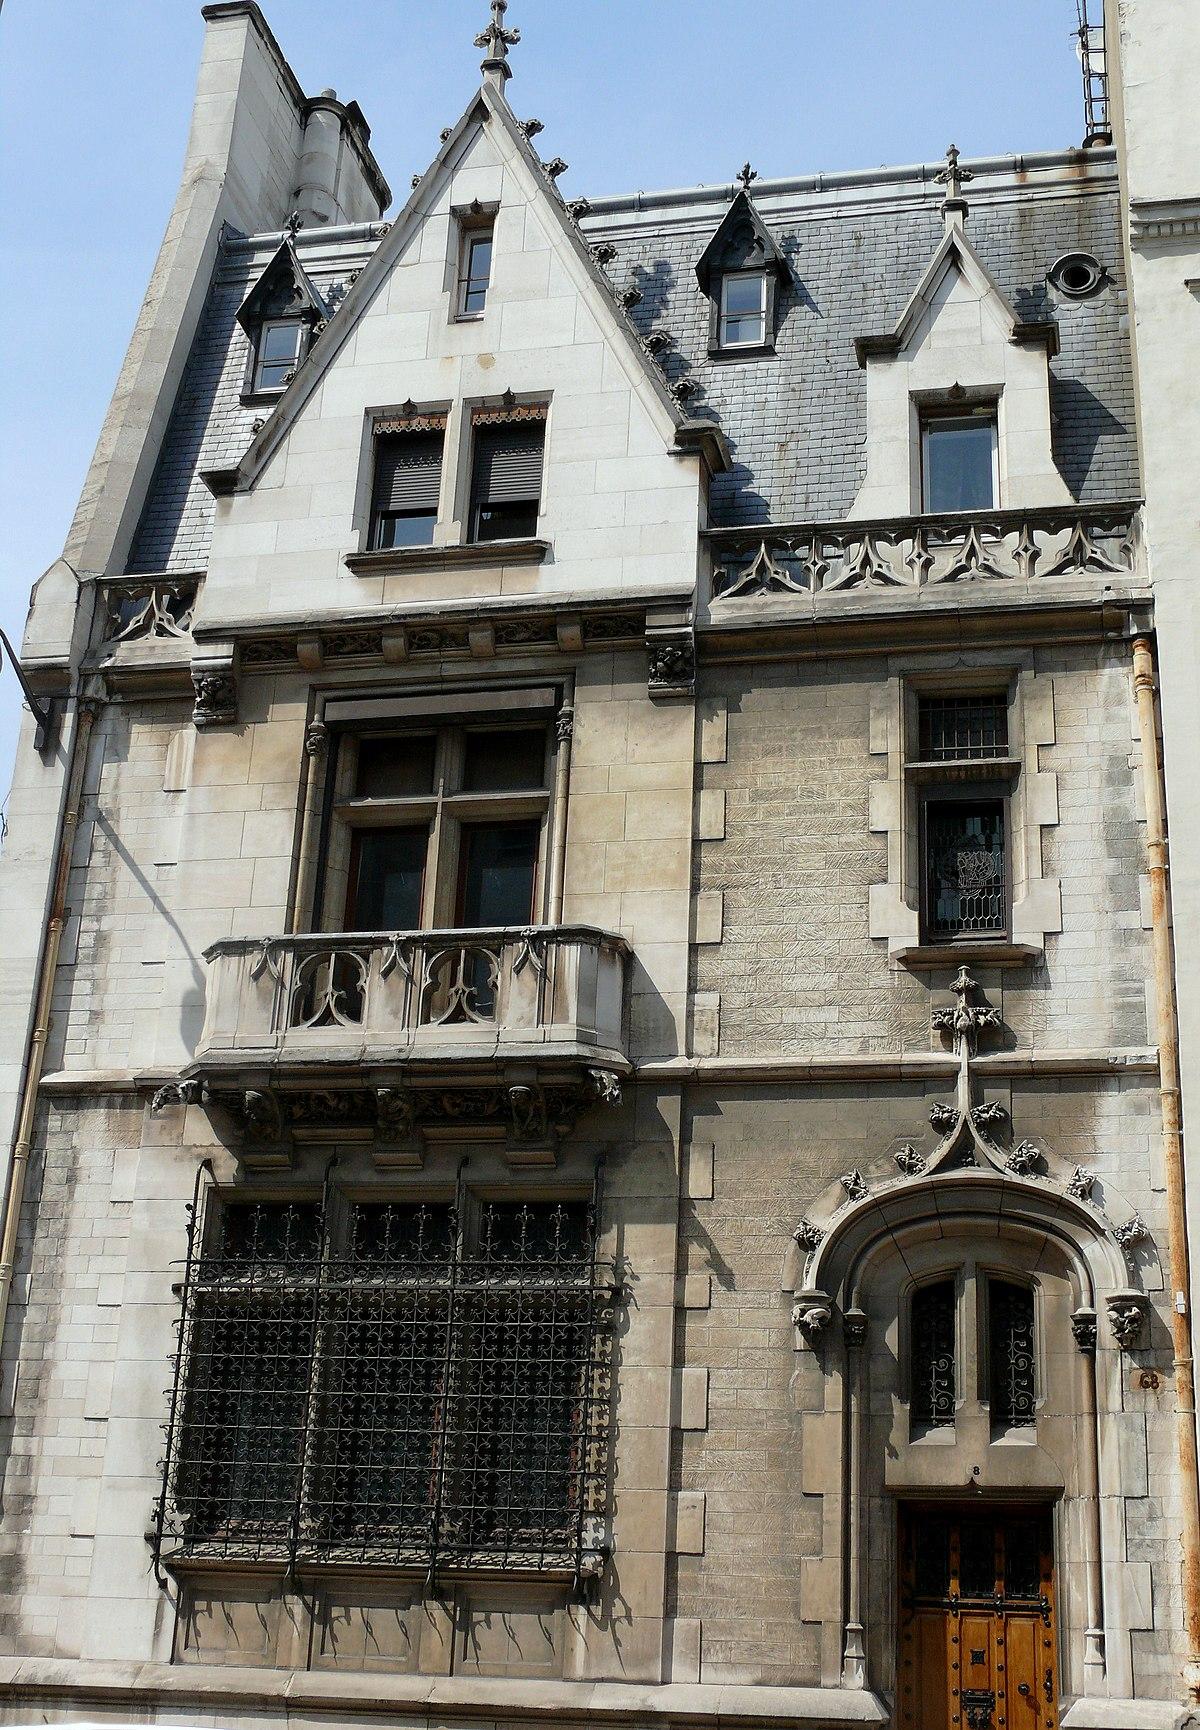 Hotel Ampere Paris France